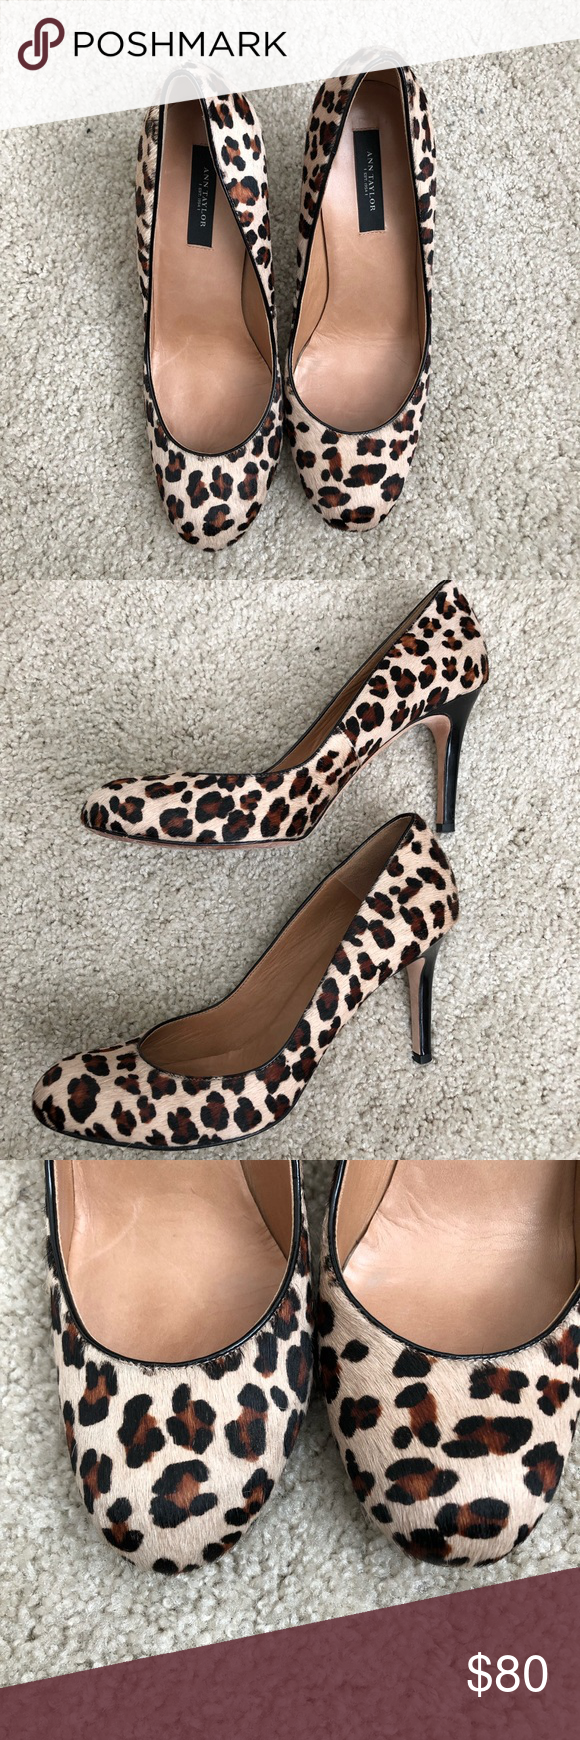 28a98fd7712 Ann Taylor Calf Hair Leopard Print Heels SZ. 7.5 Size  7.5 In excellent  condition